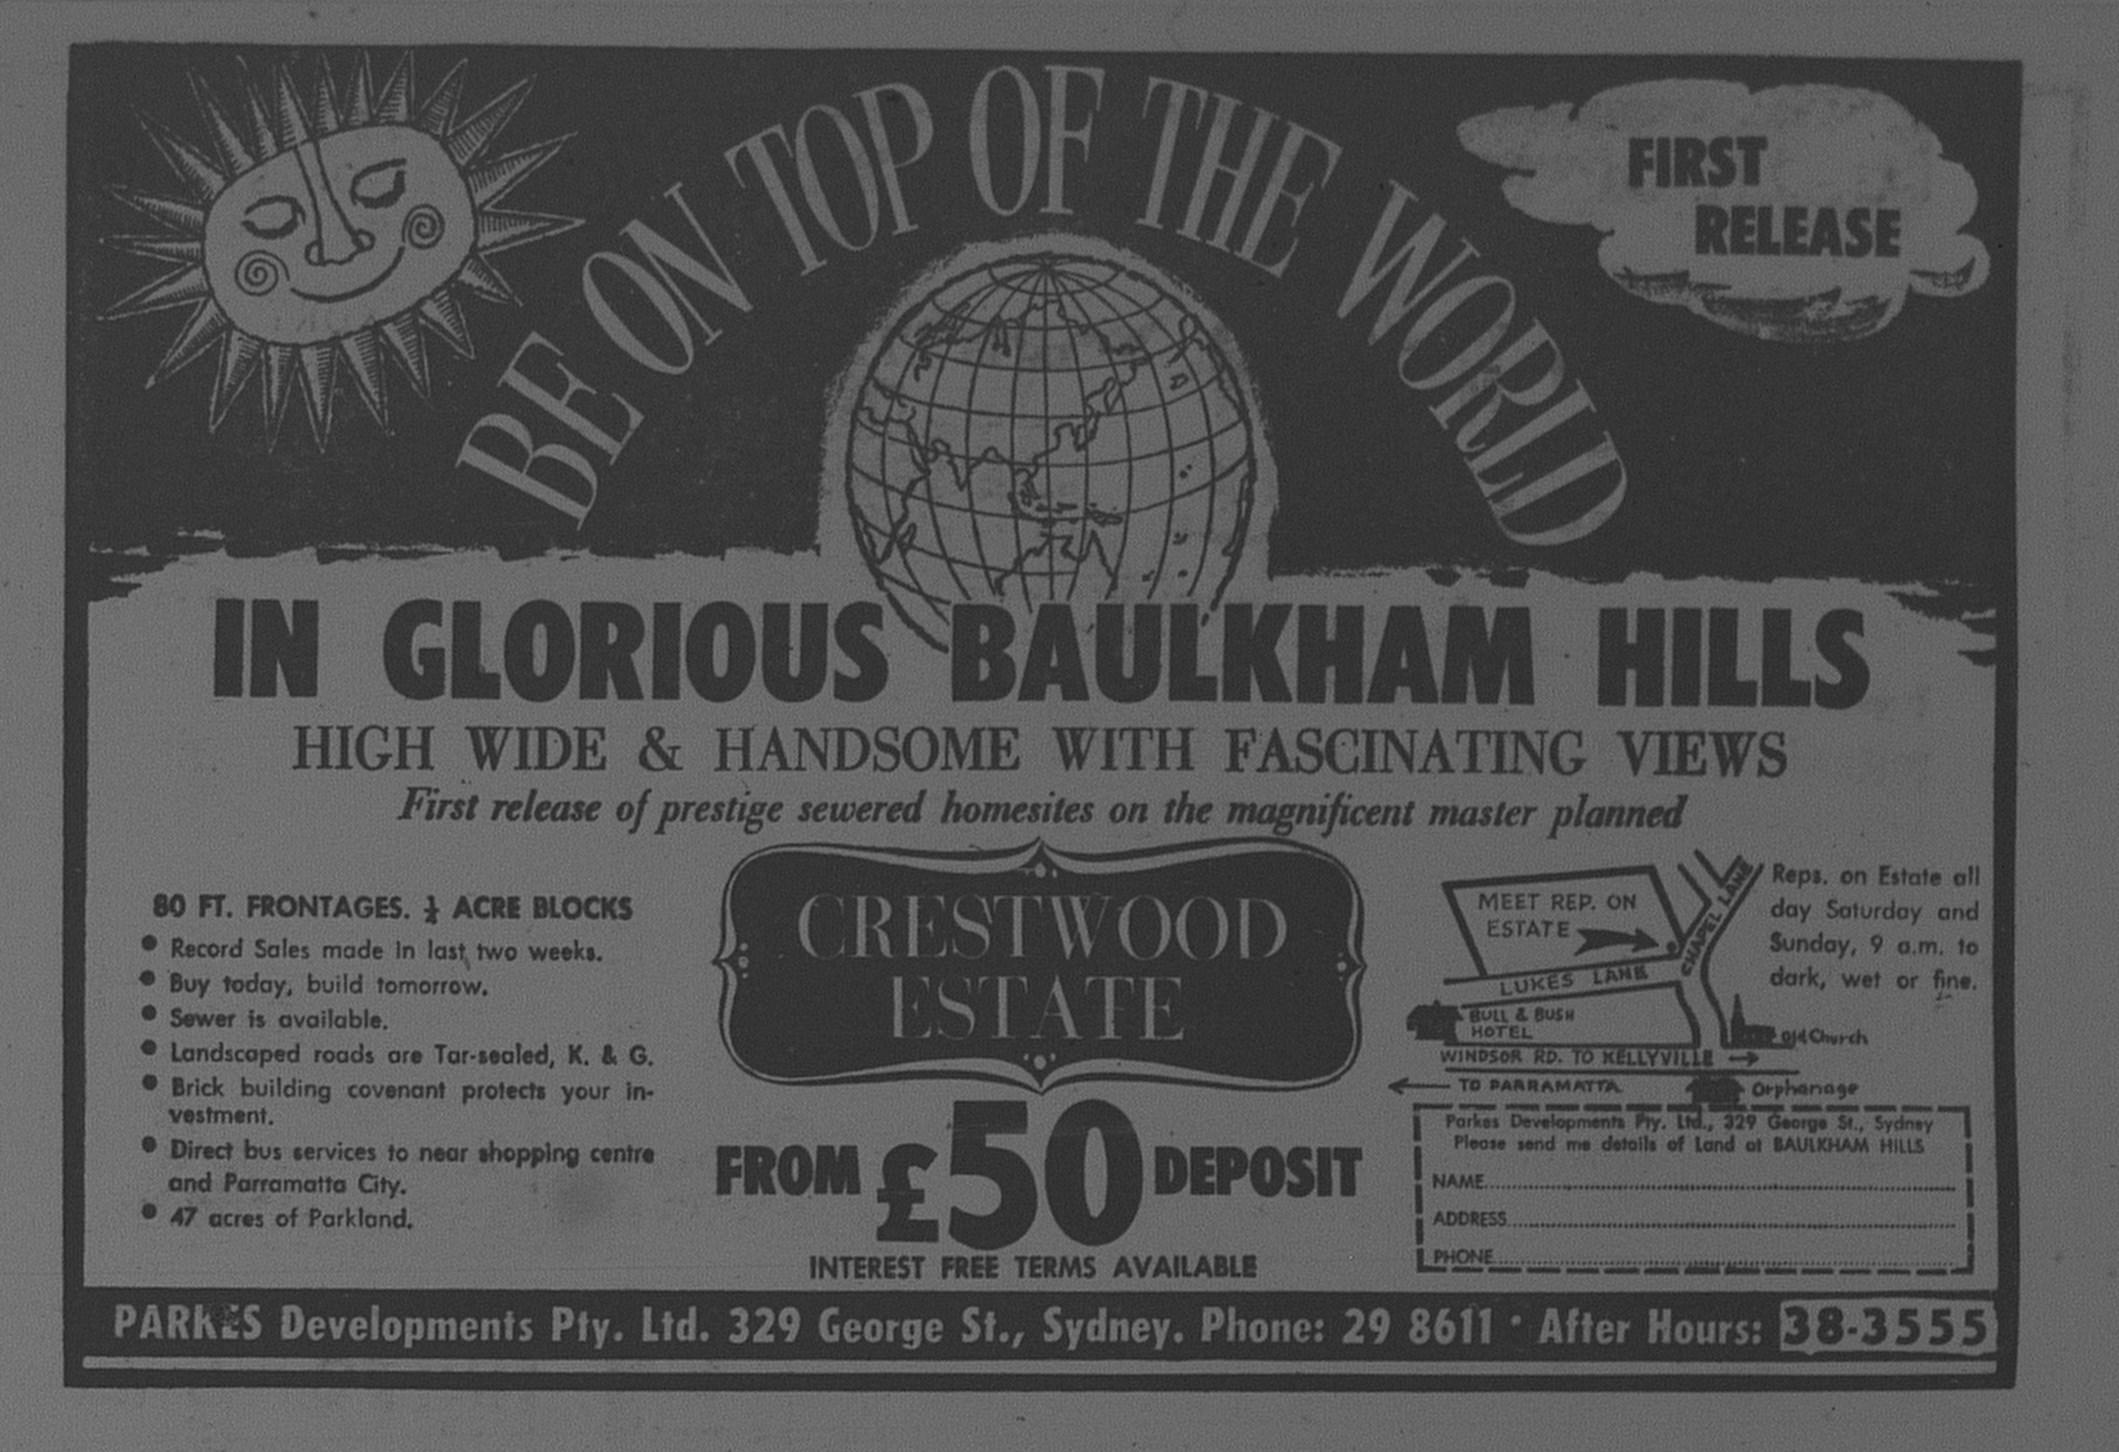 Crestwood Estate Baulkham Hills Ad October 7 1966 The Sun 47